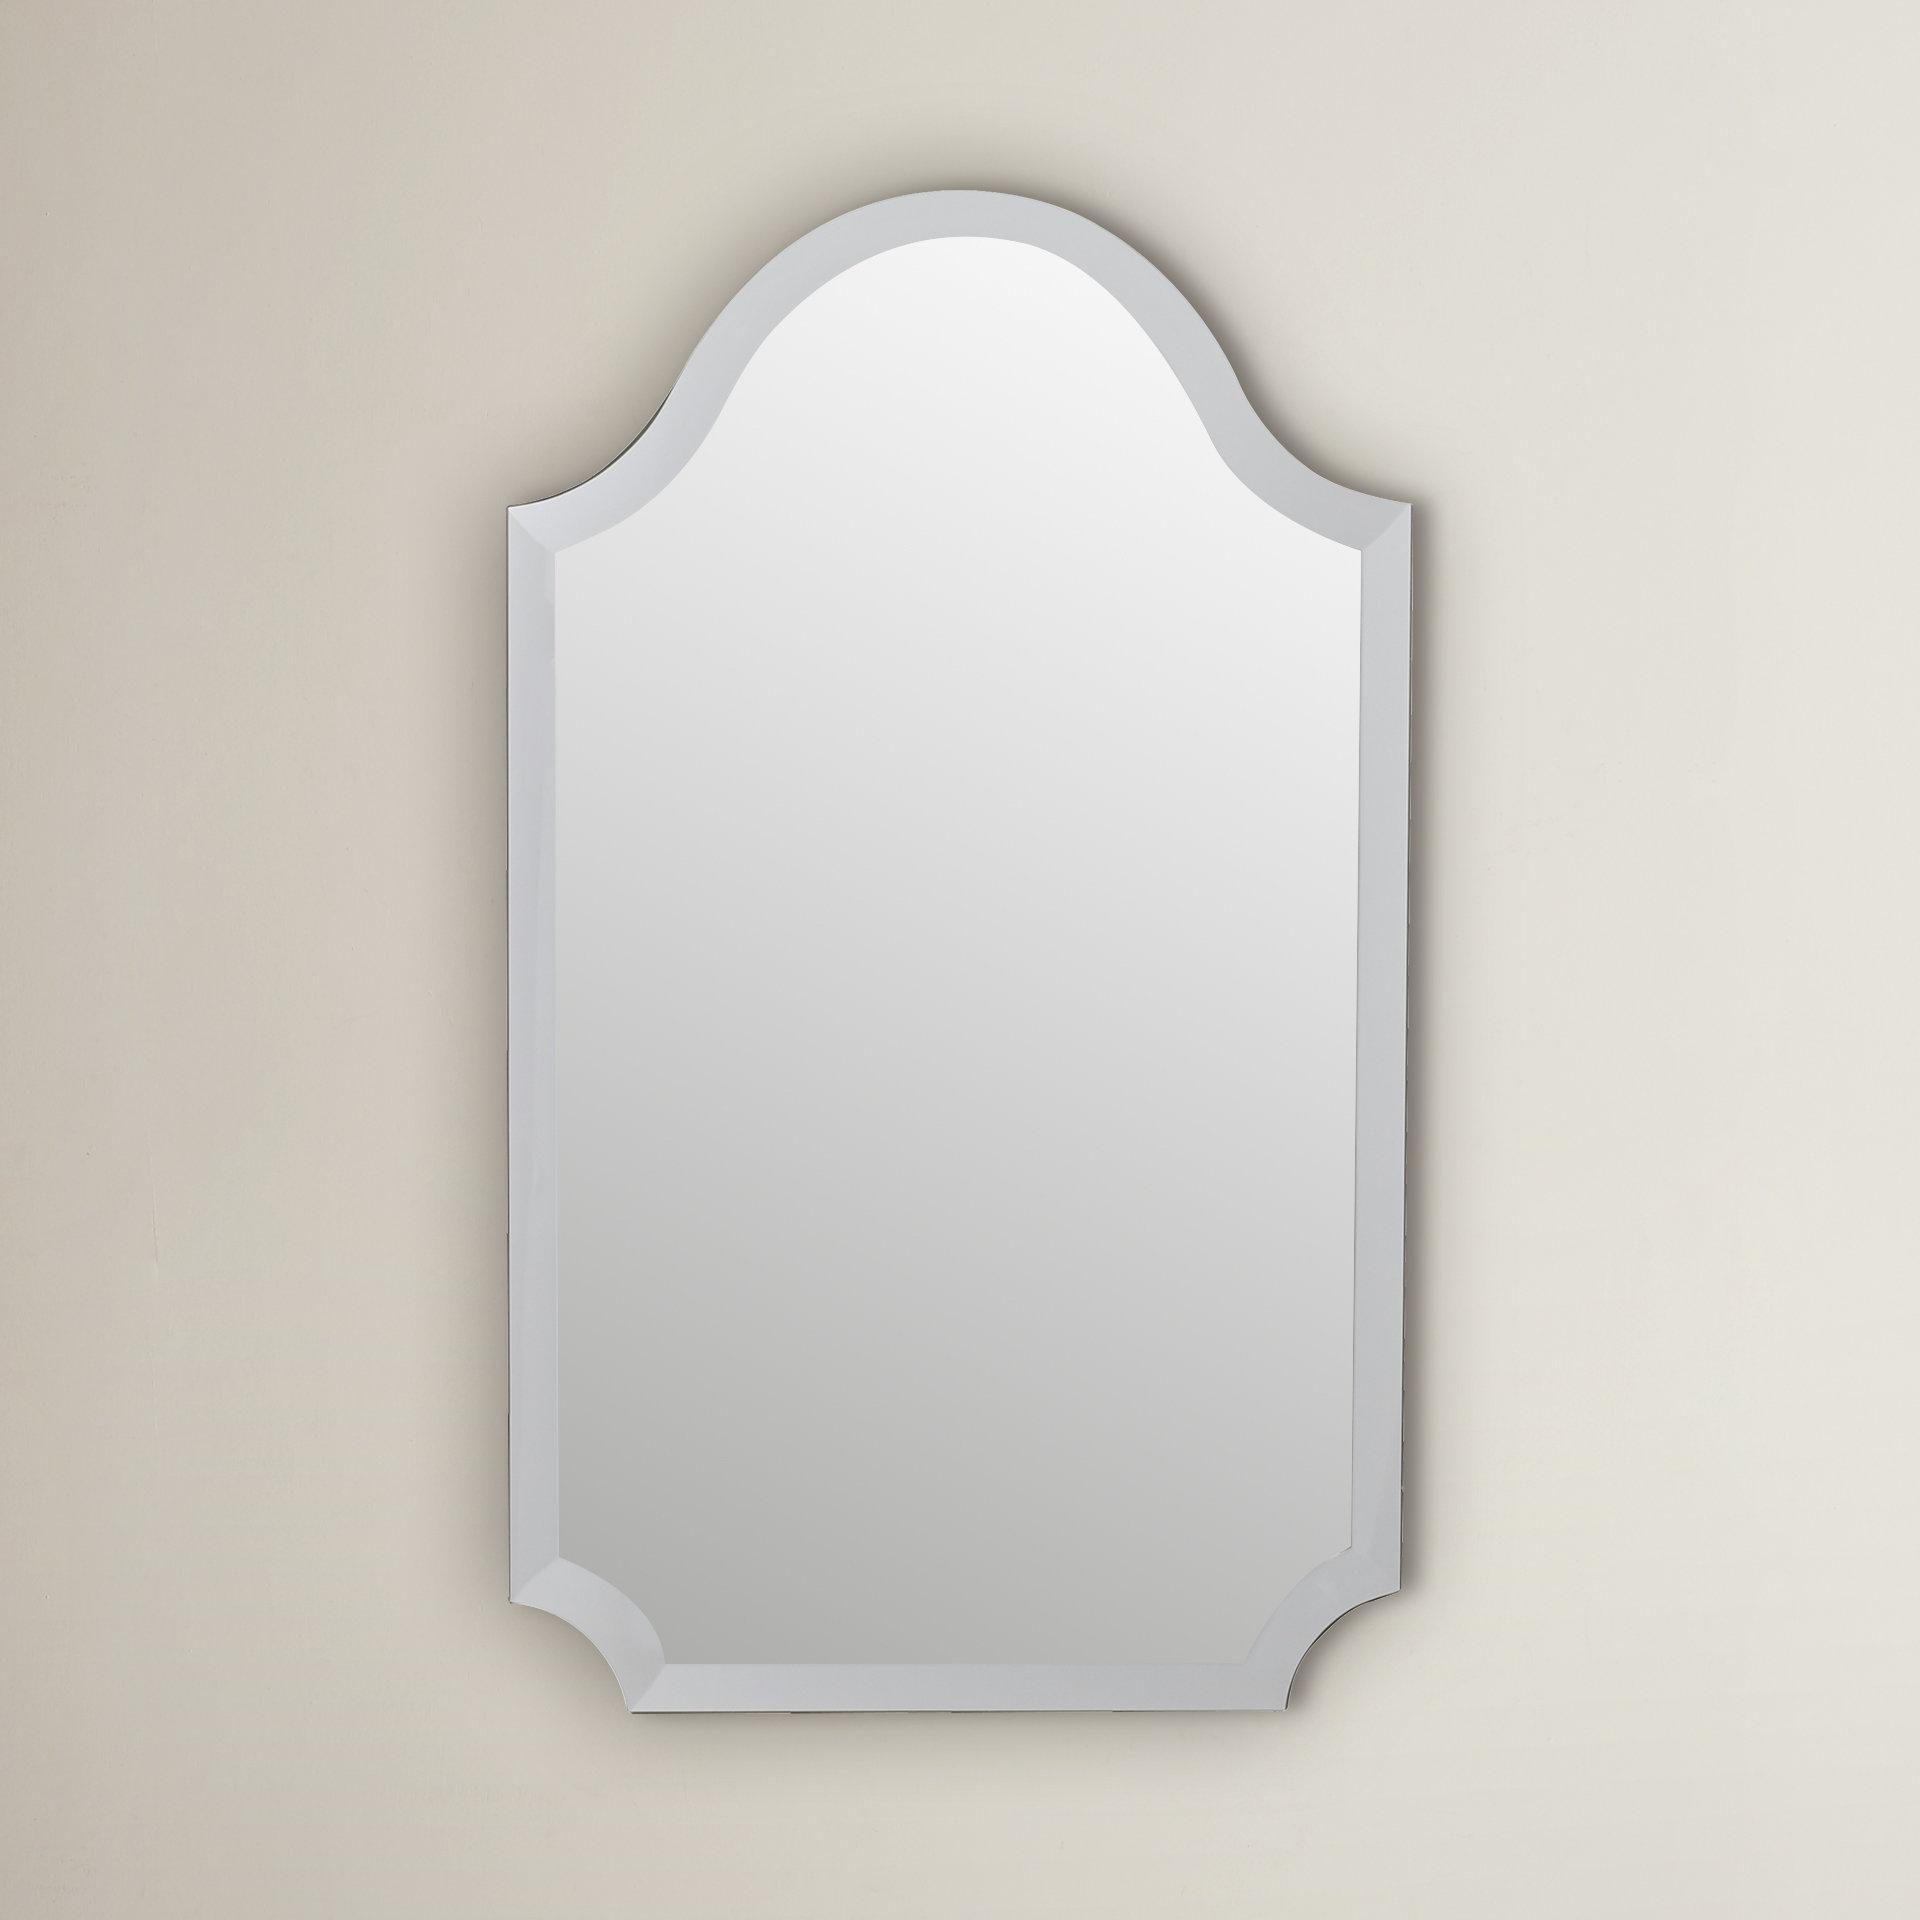 Willa Arlo Interiors Dariel Tall Arched Scalloped Wall Mirror Within Dariel Tall Arched Scalloped Wall Mirrors (Image 19 of 20)